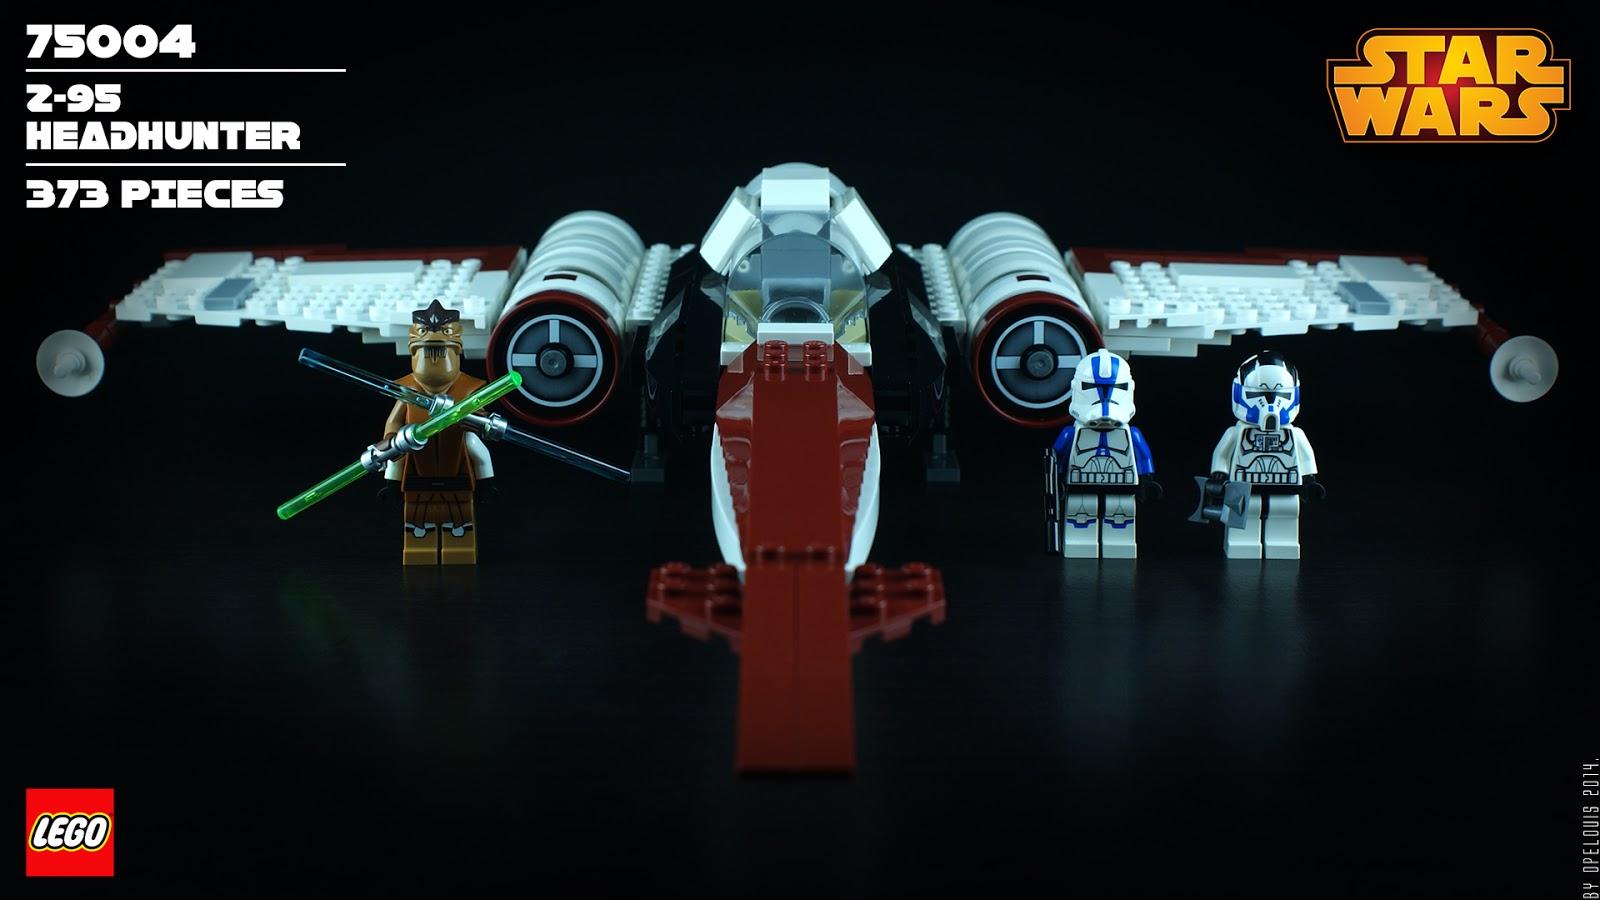 Z-95 Headhunter STICKER SHEET Star Wars LEGO 75004